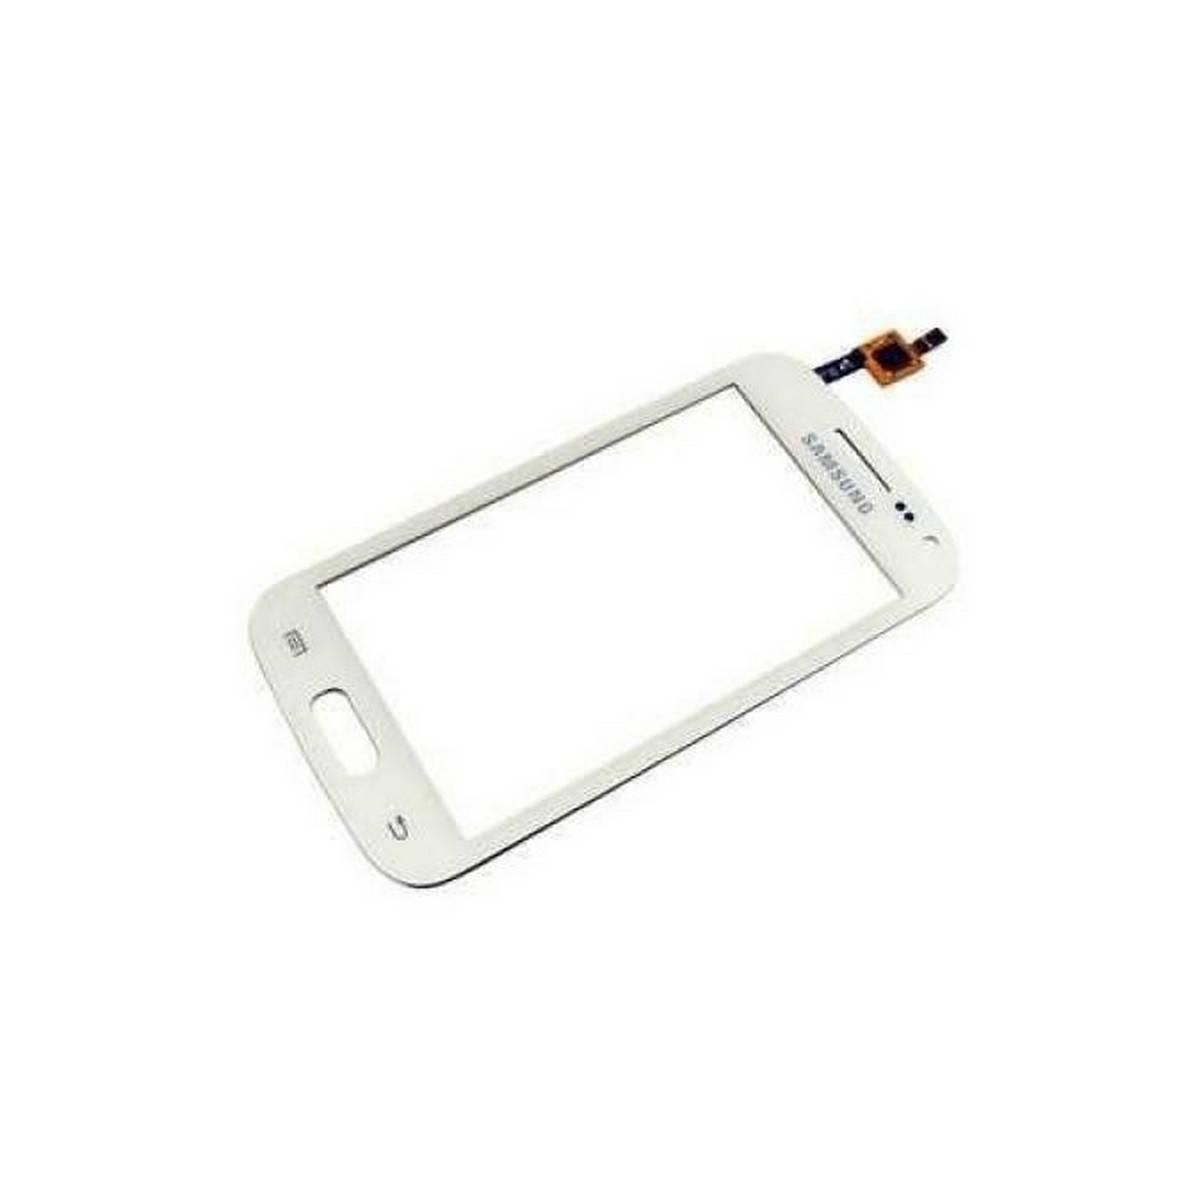 Pantalla táctil Samsung Galaxy Ace Plus S7500 blanca